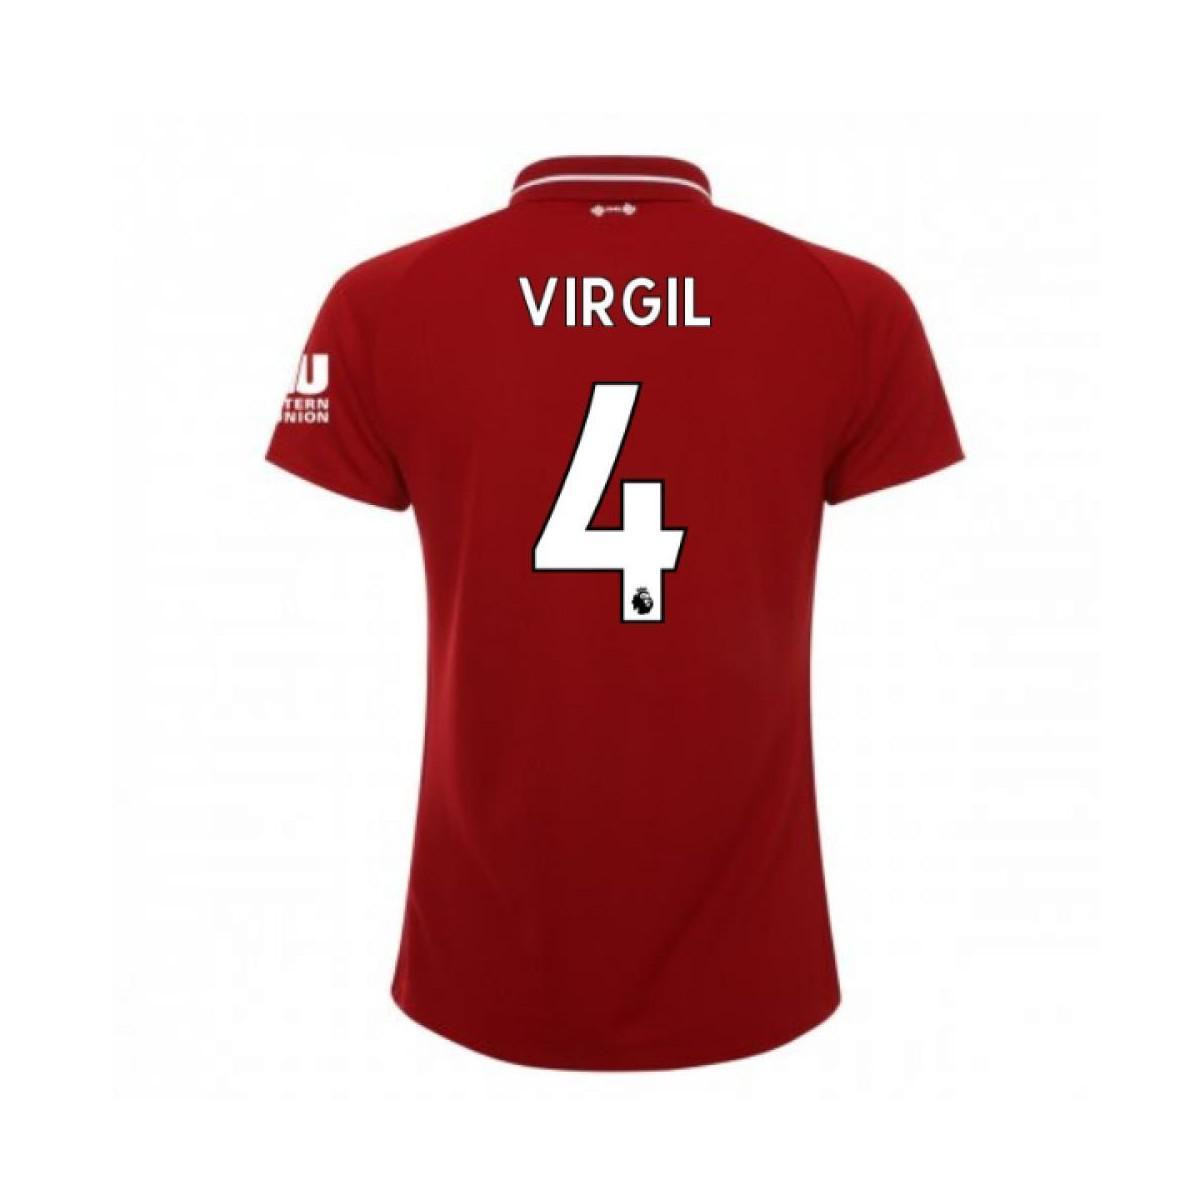 3a020098 New Balance 2018-2019 Liverpool Home Ladies Football Shirt (virgil 4 ...